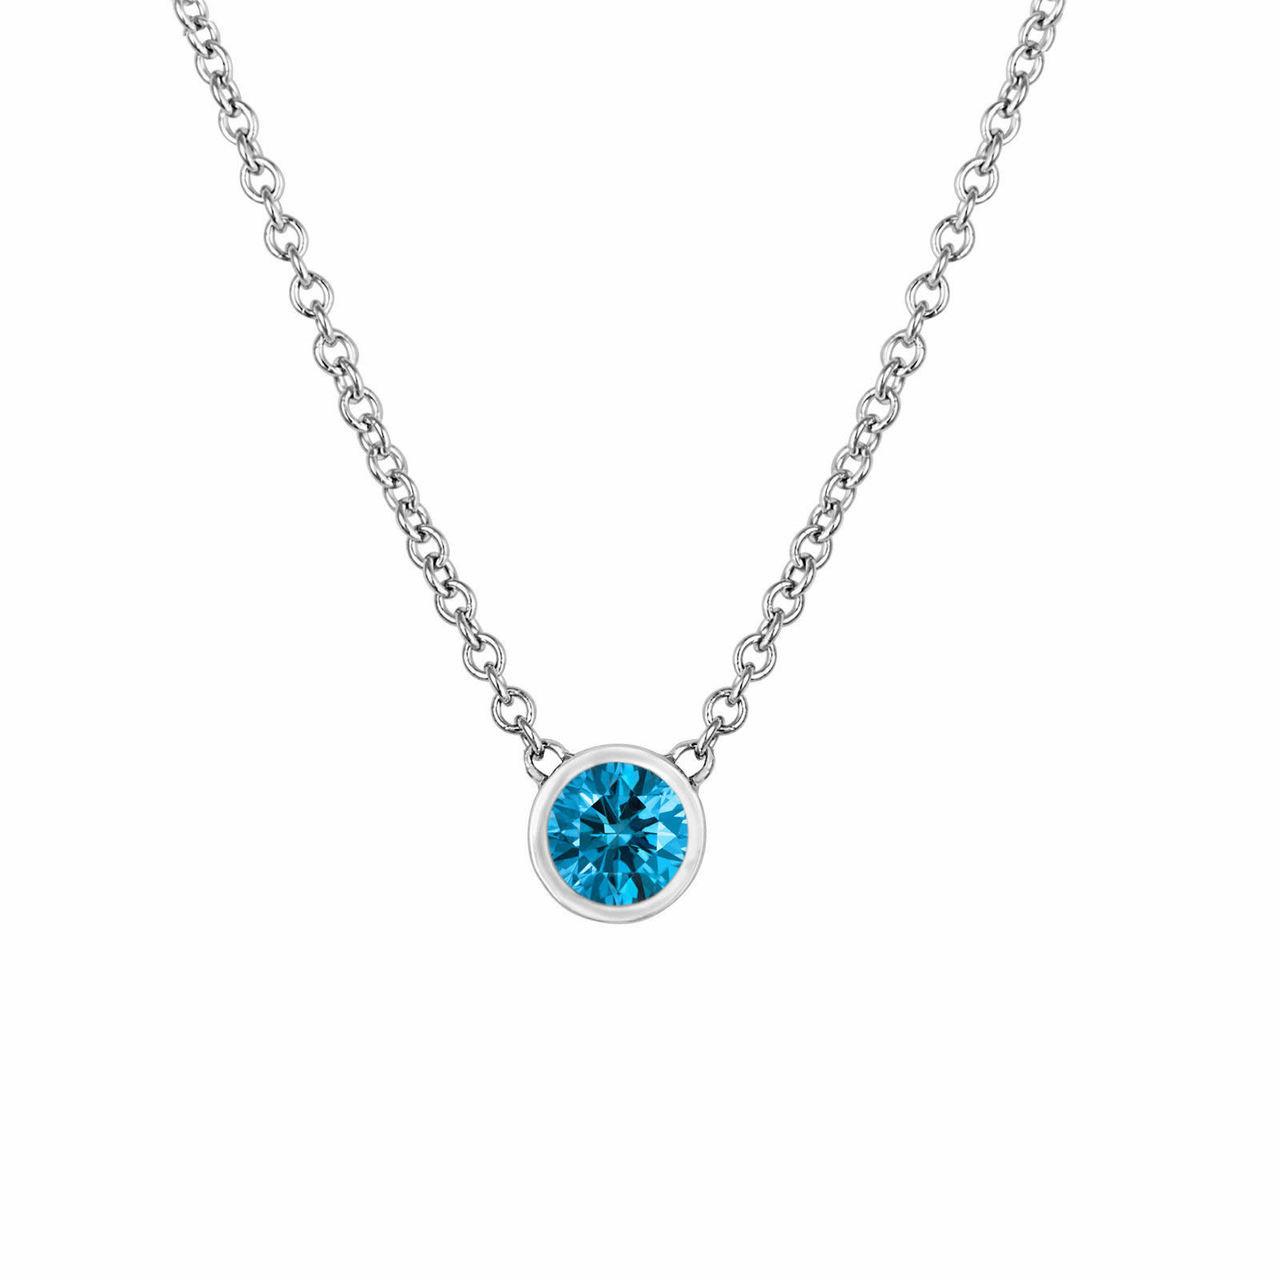 Blue diamond solitaire pendant diamond by the yard necklace blue diamond solitaire pendant diamond by the yard necklace solitaire pendant necklace 14k white gold handmade aloadofball Choice Image